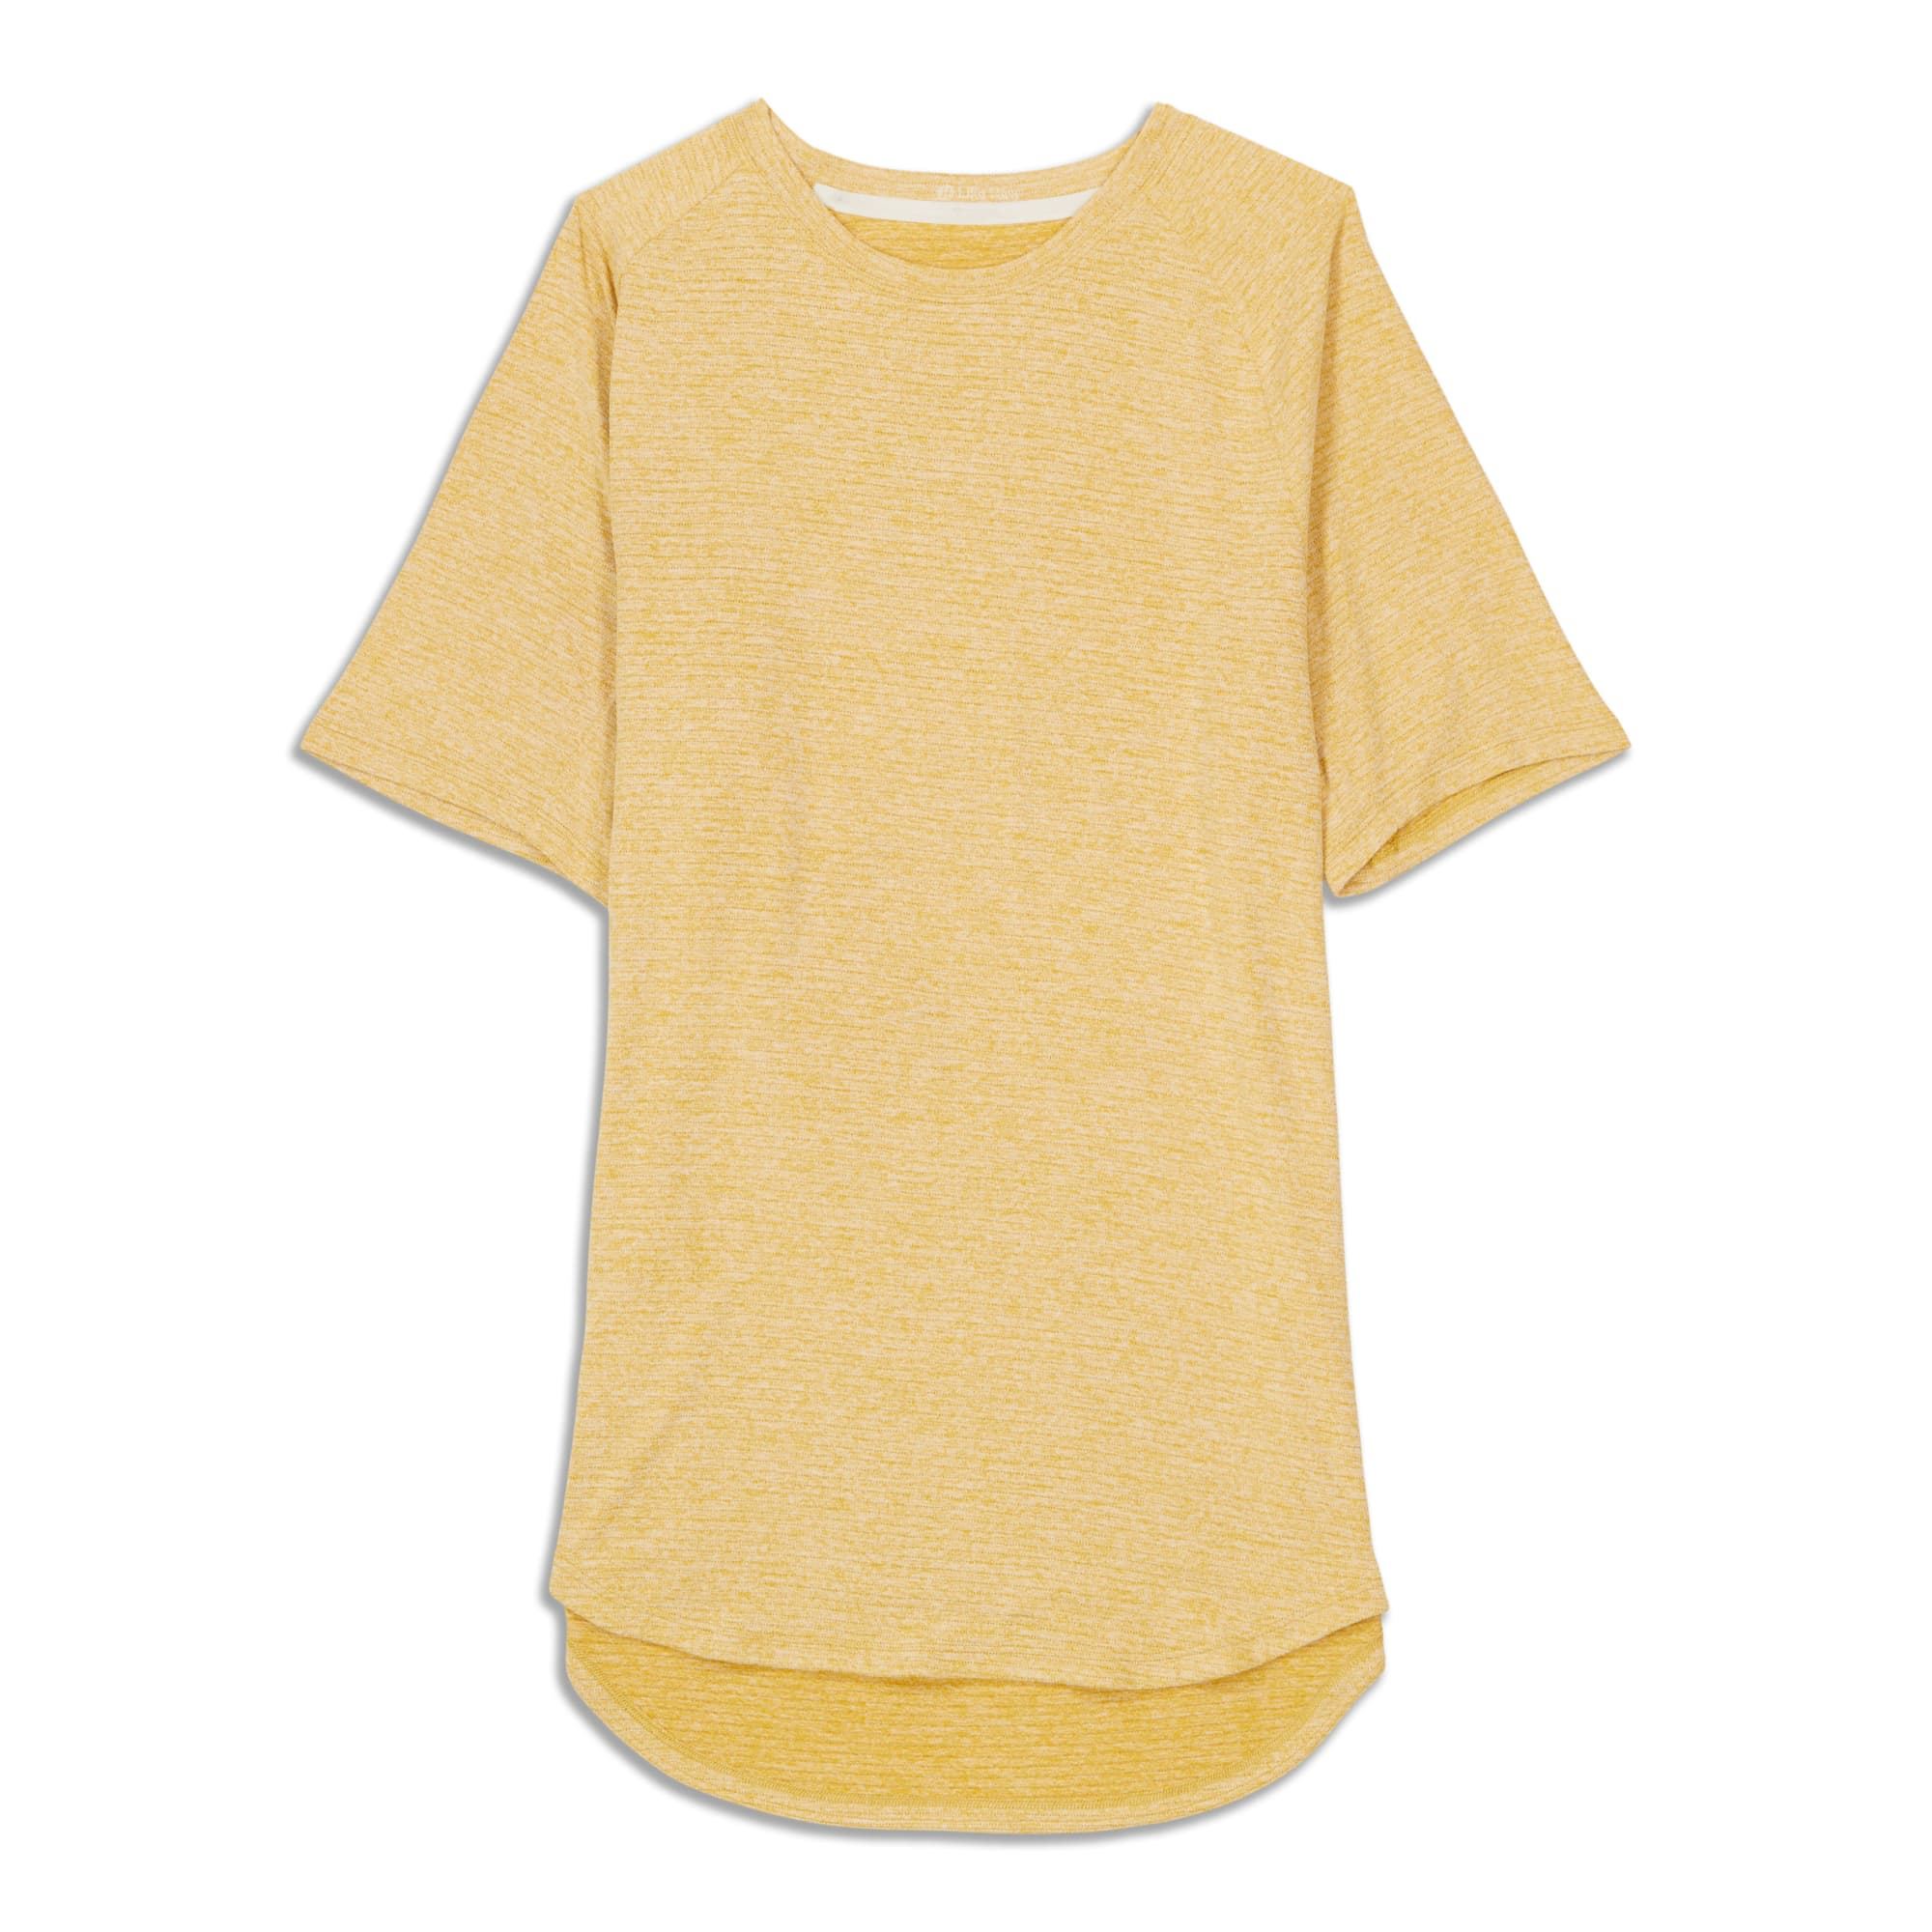 Main product image: Drysense Mesh Short Sleeve Shirt - Resale